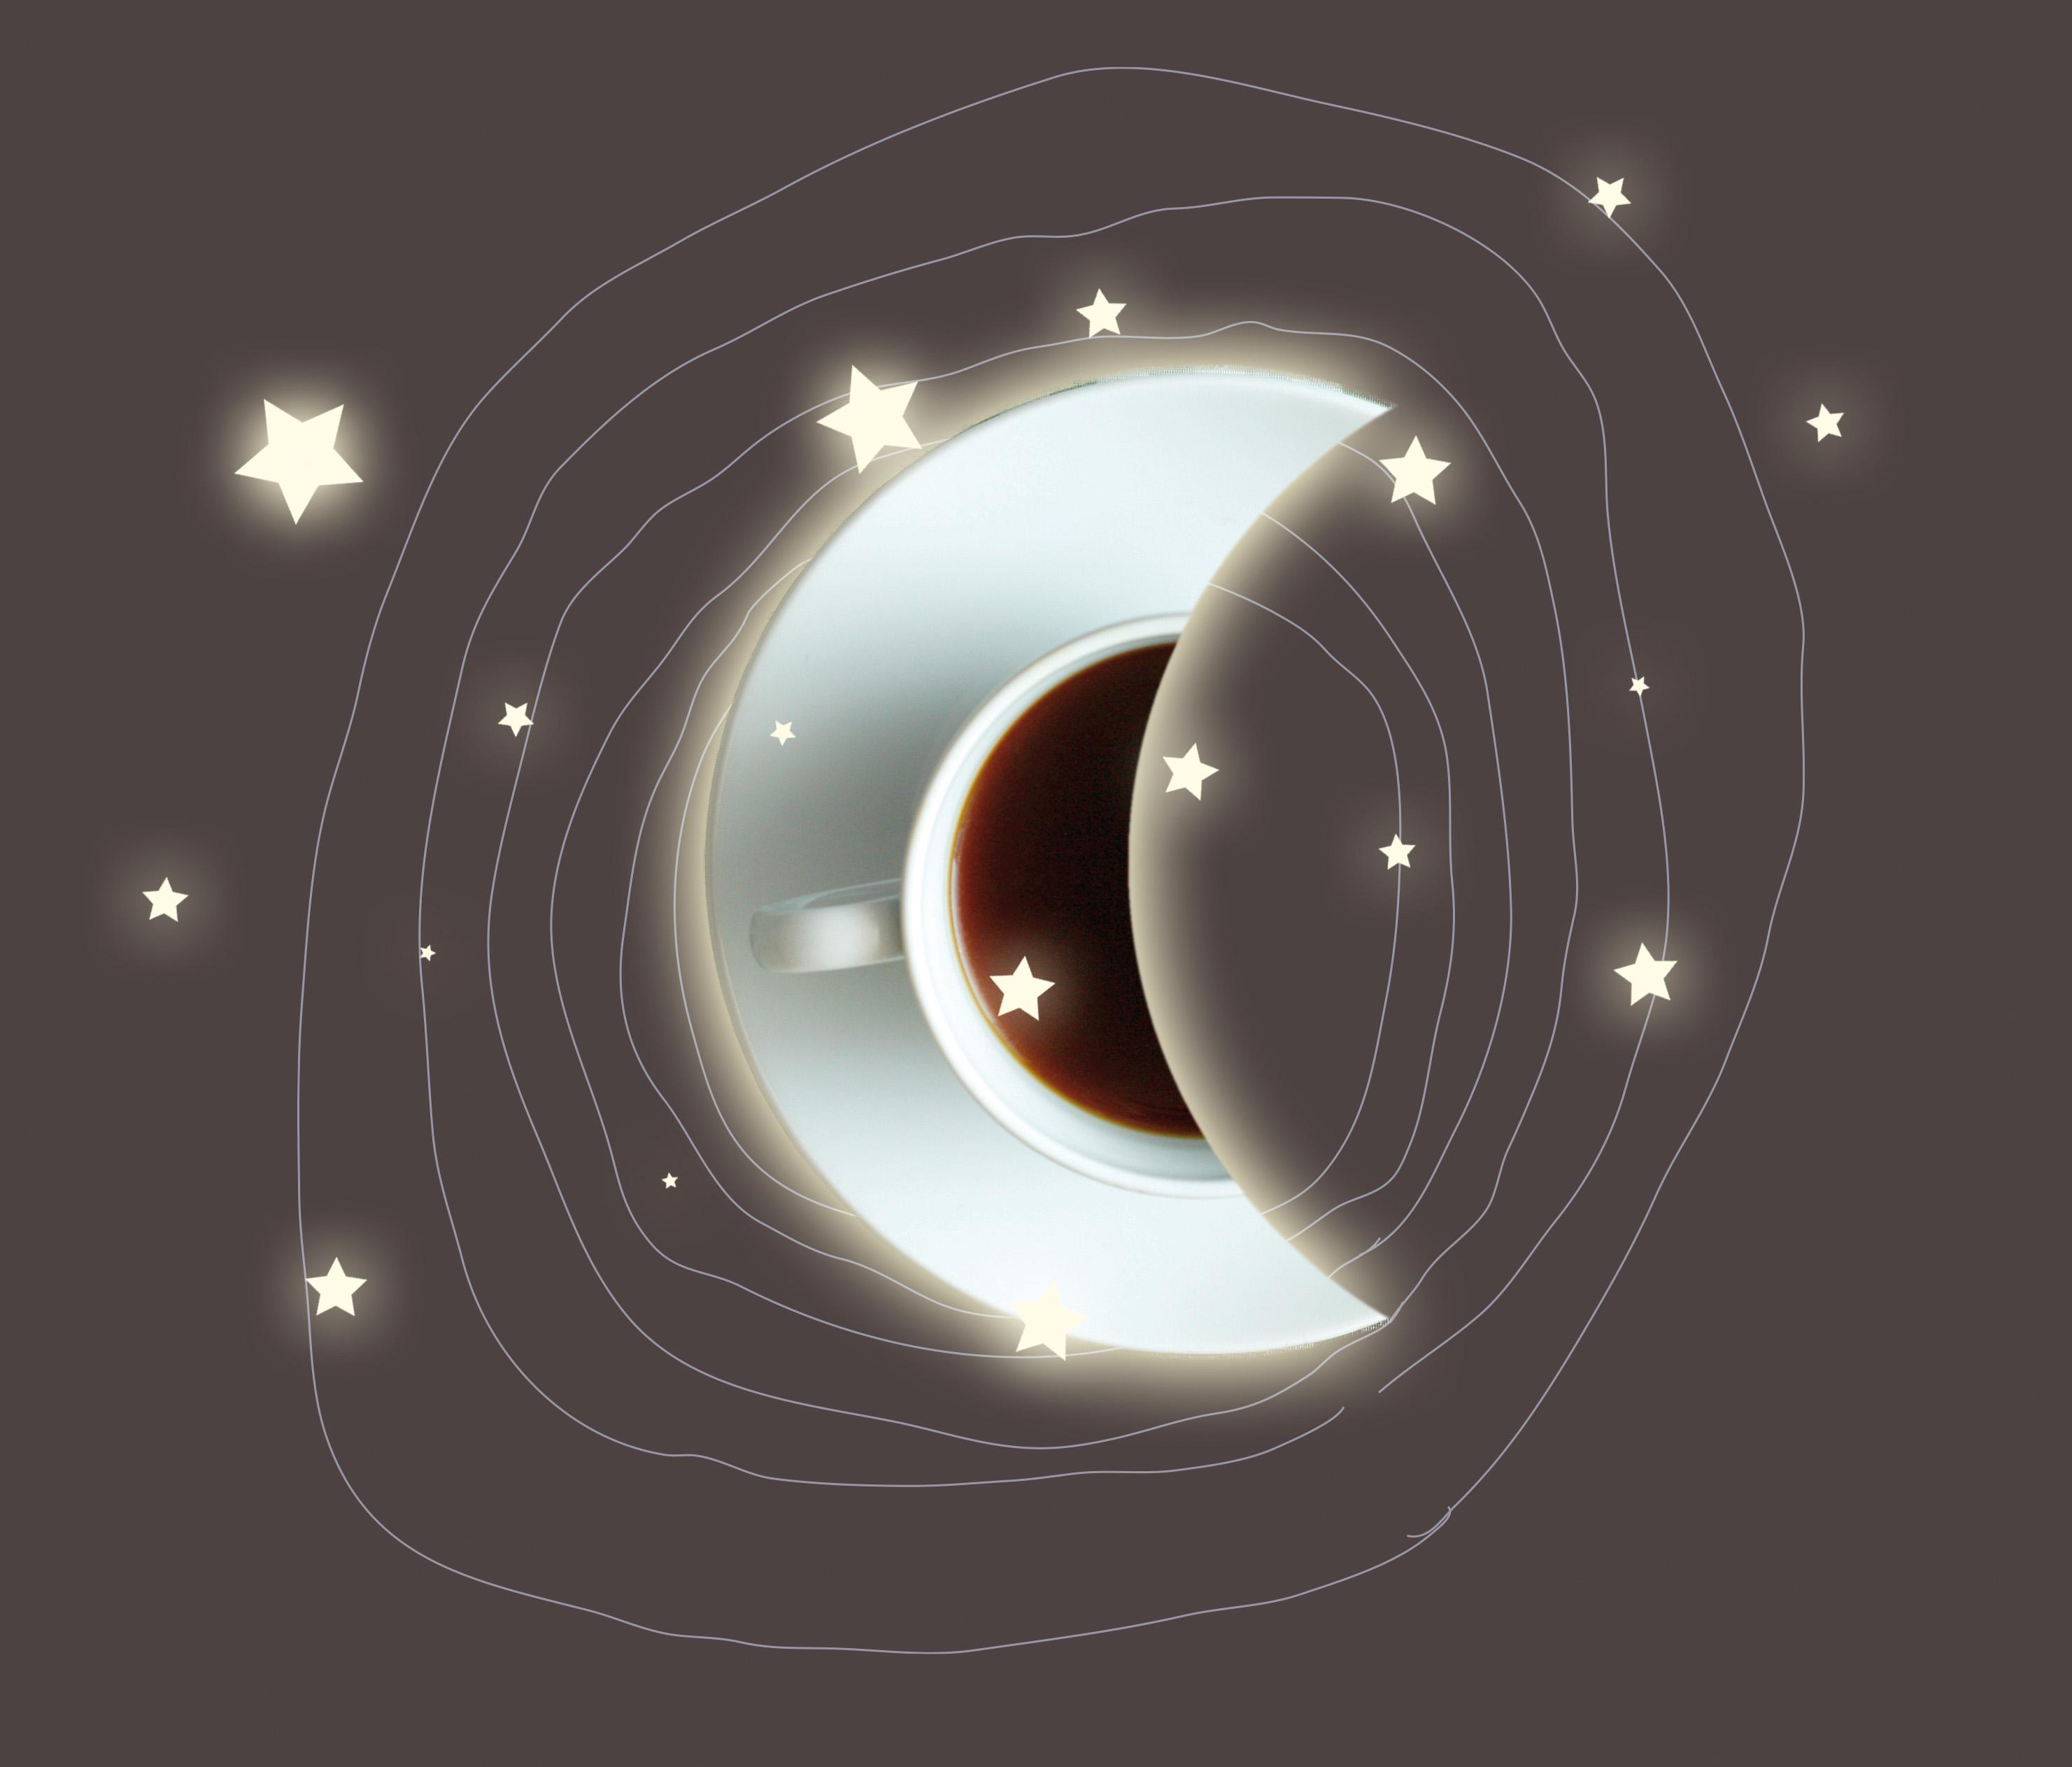 La compagnie Clair de Lune